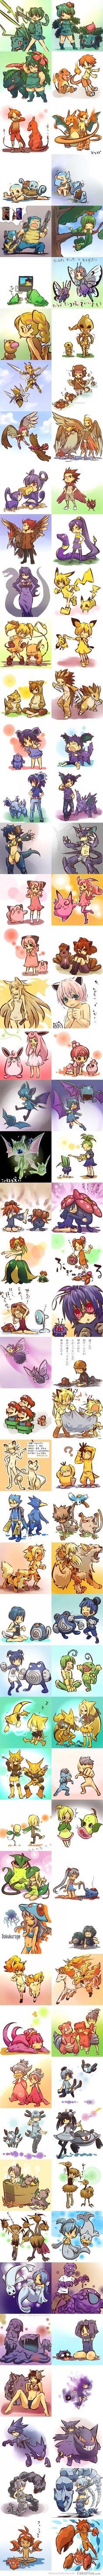 If Pokemon were humans... :D